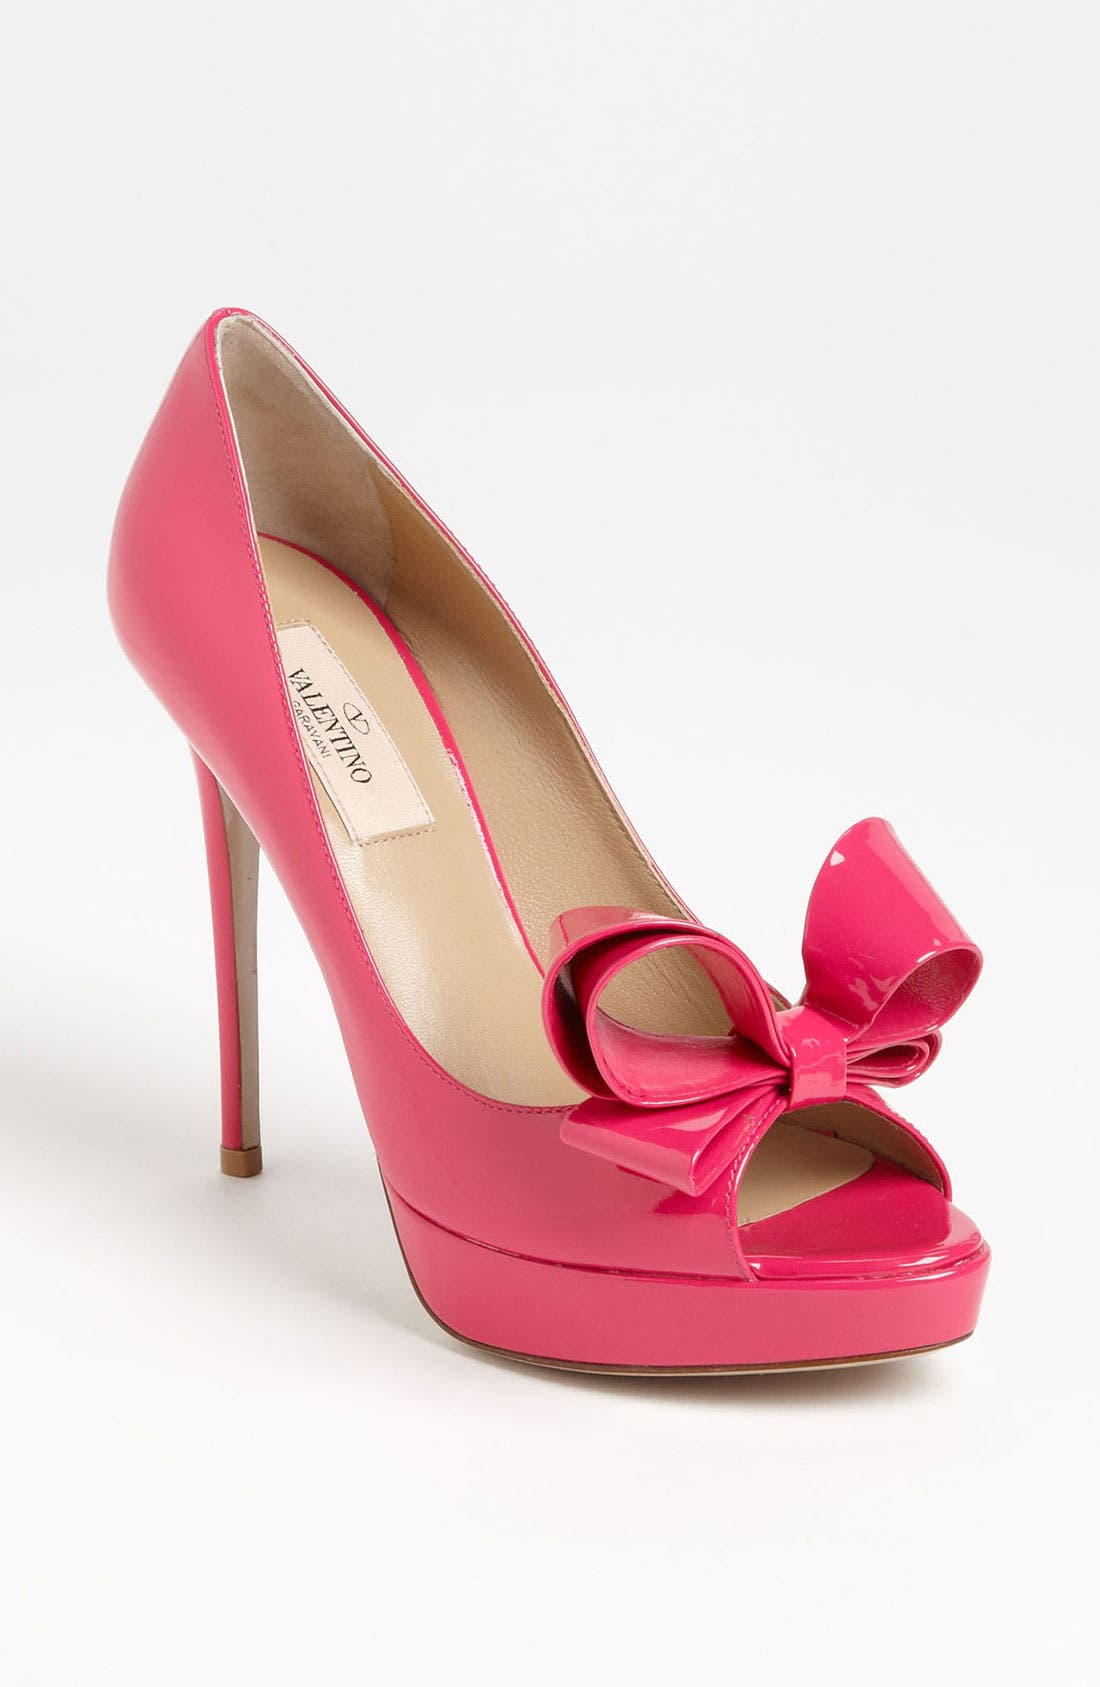 Main Image - VALENTINO GARAVANI Couture Bow Platform Pump (Women)